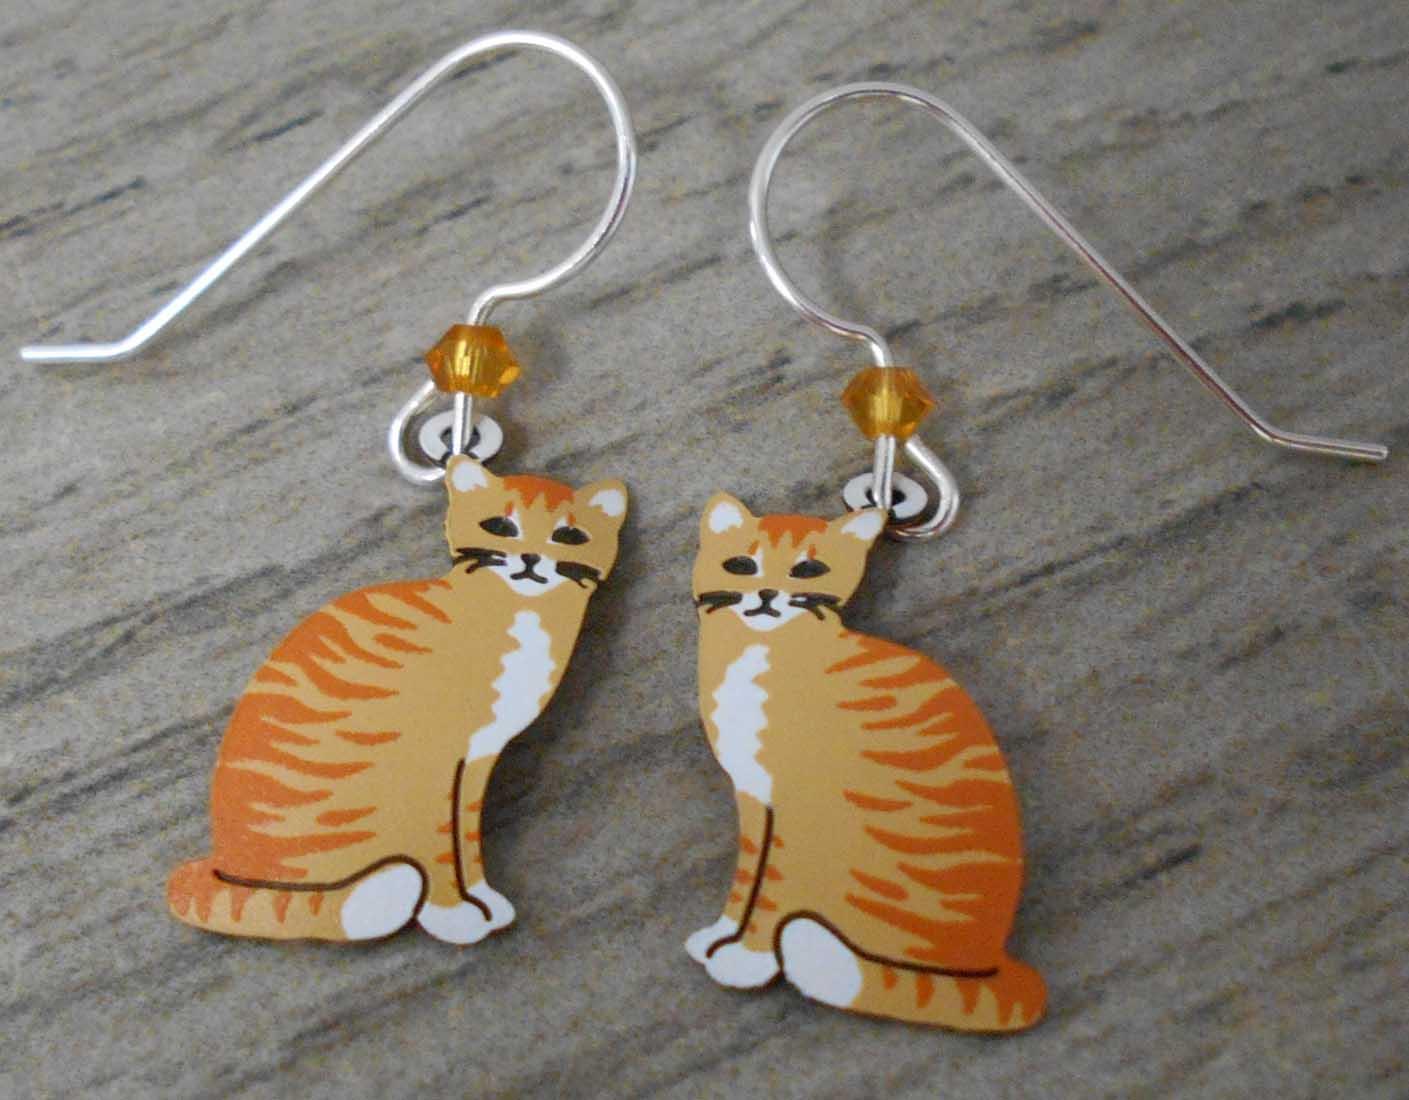 orange and white striped cat Sienna Sky earrings